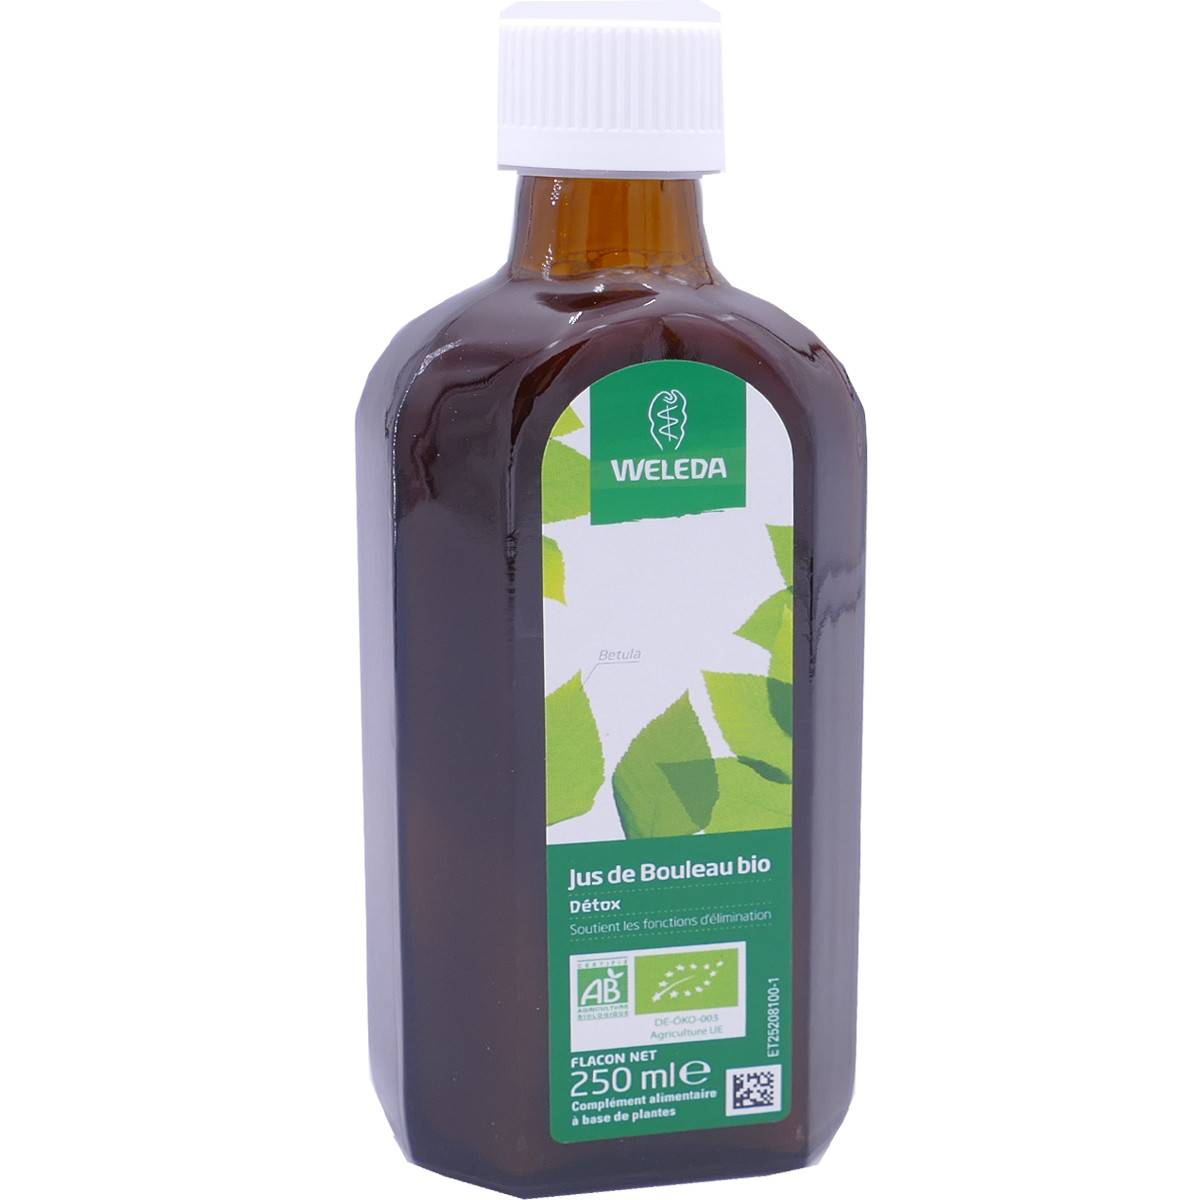 Weleda jus de bouleau bio 250 ml detox